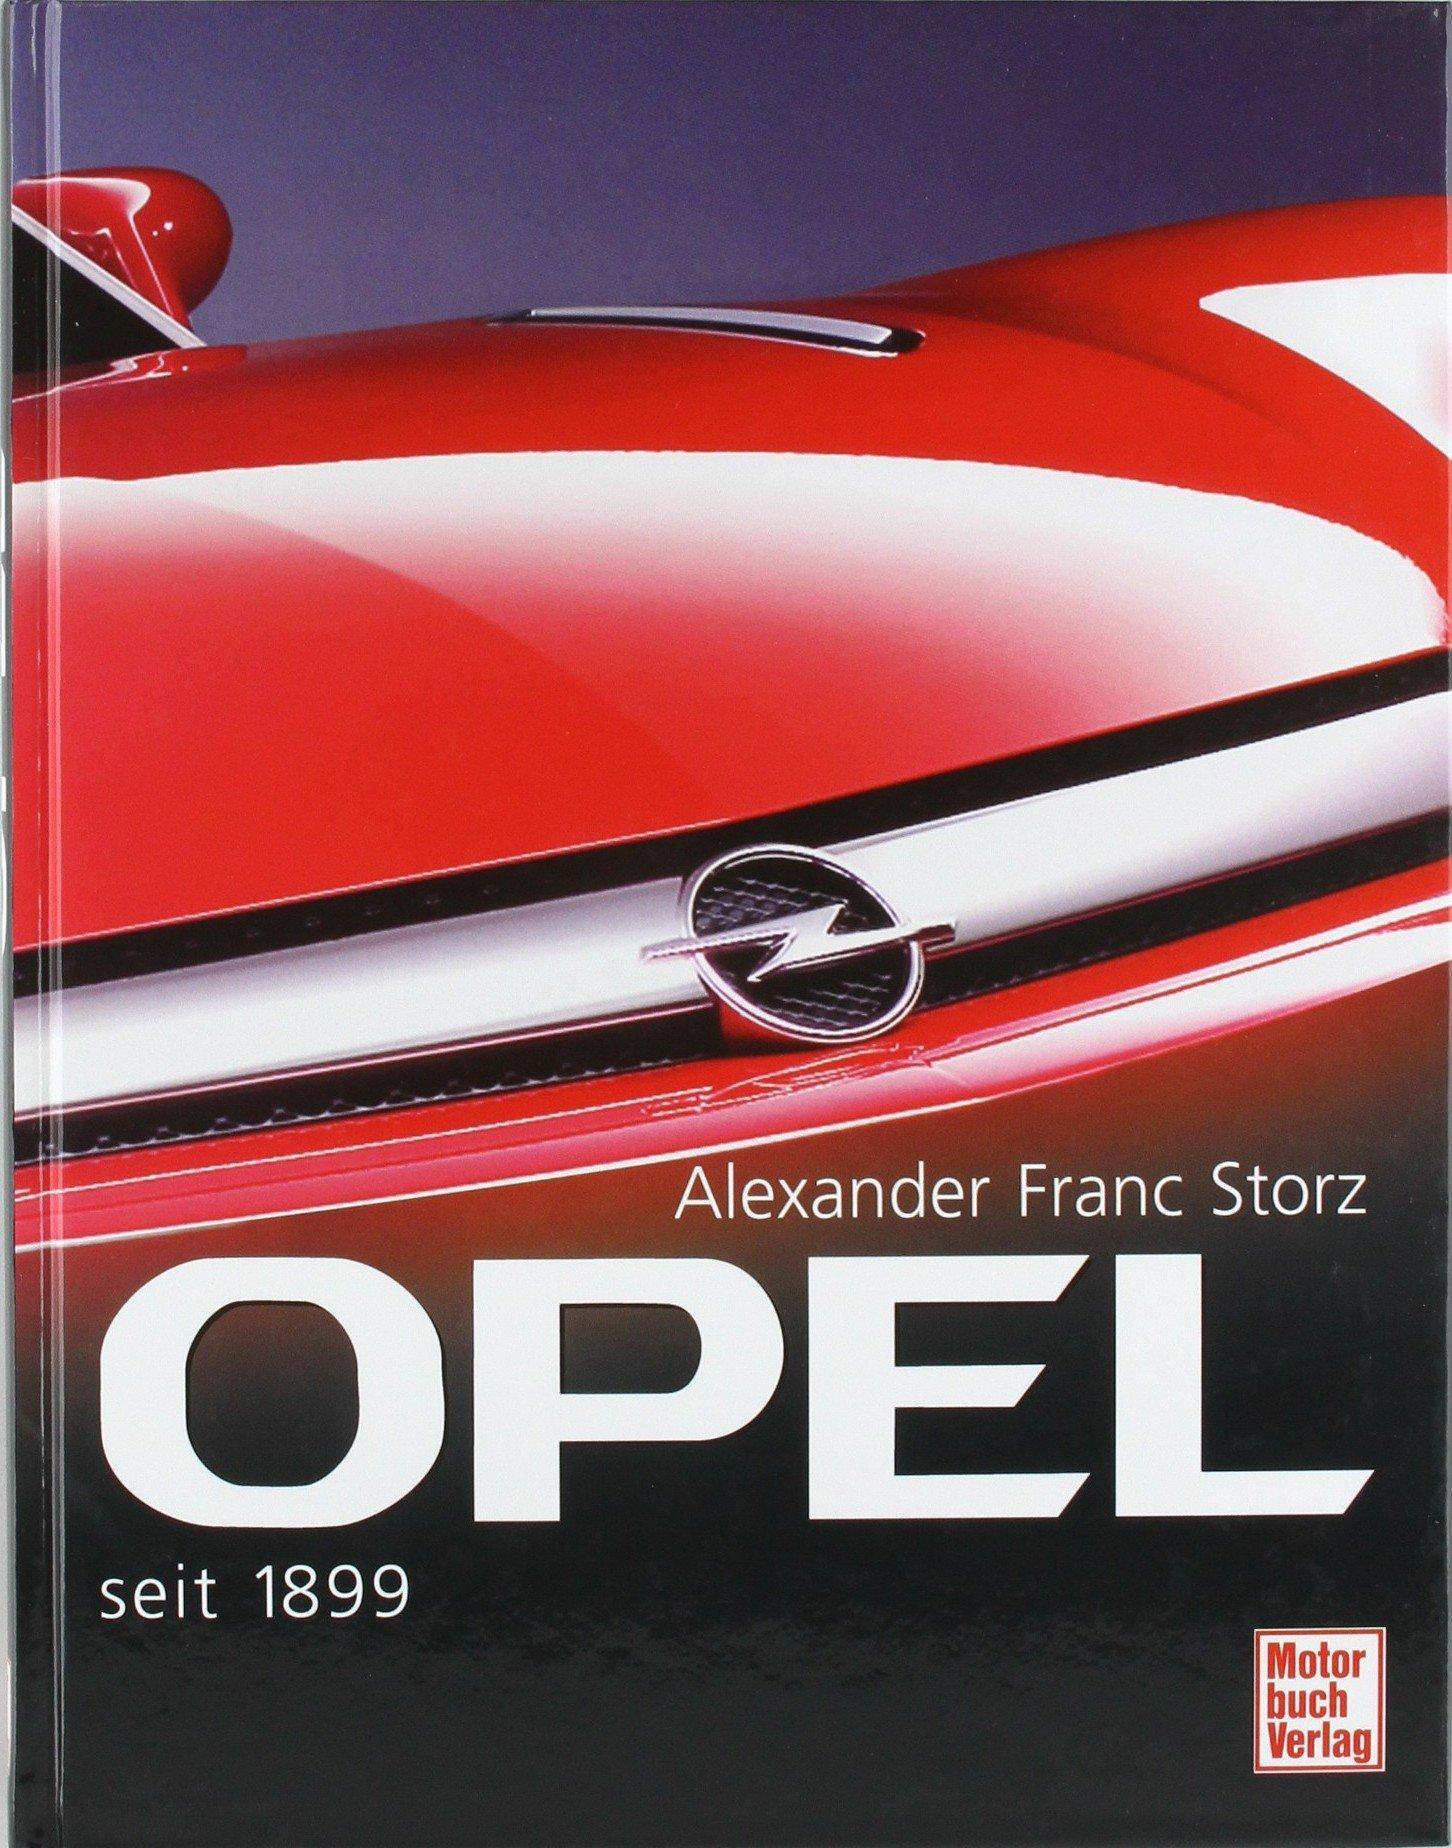 Opel: seit 1899